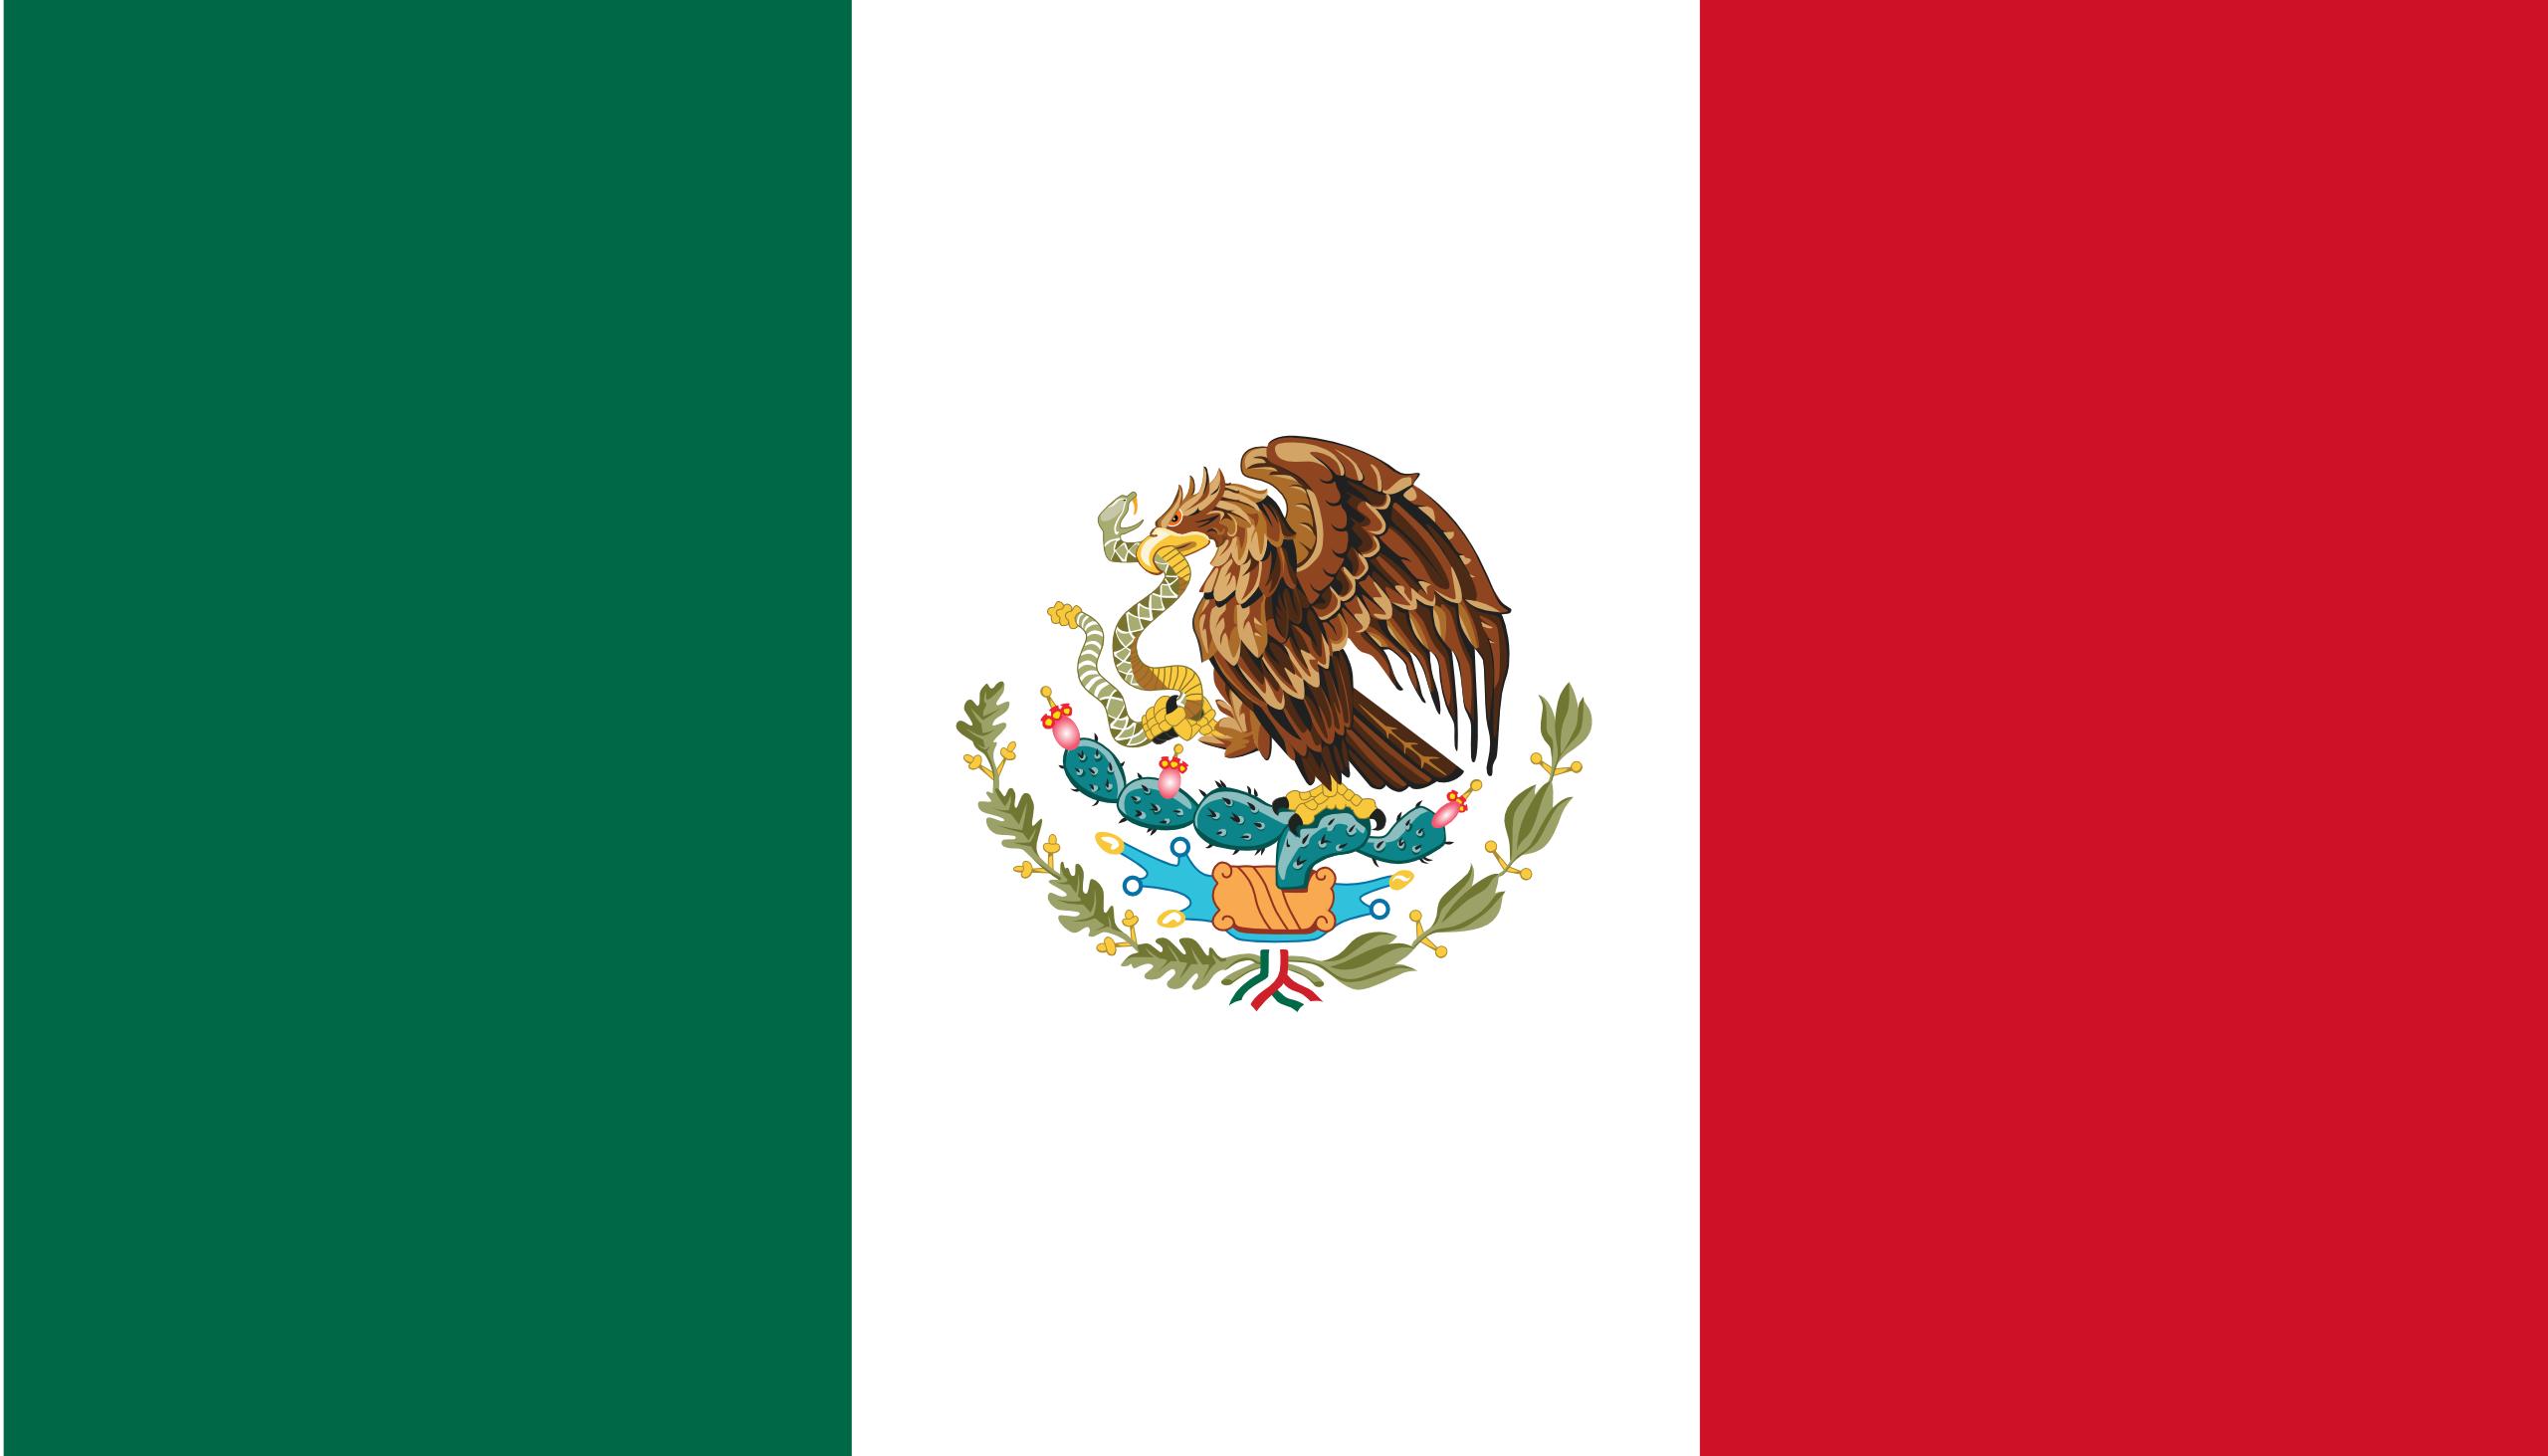 méxico, pays, emblème, logo, symbole - Fonds d'écran HD - Professor-falken.com